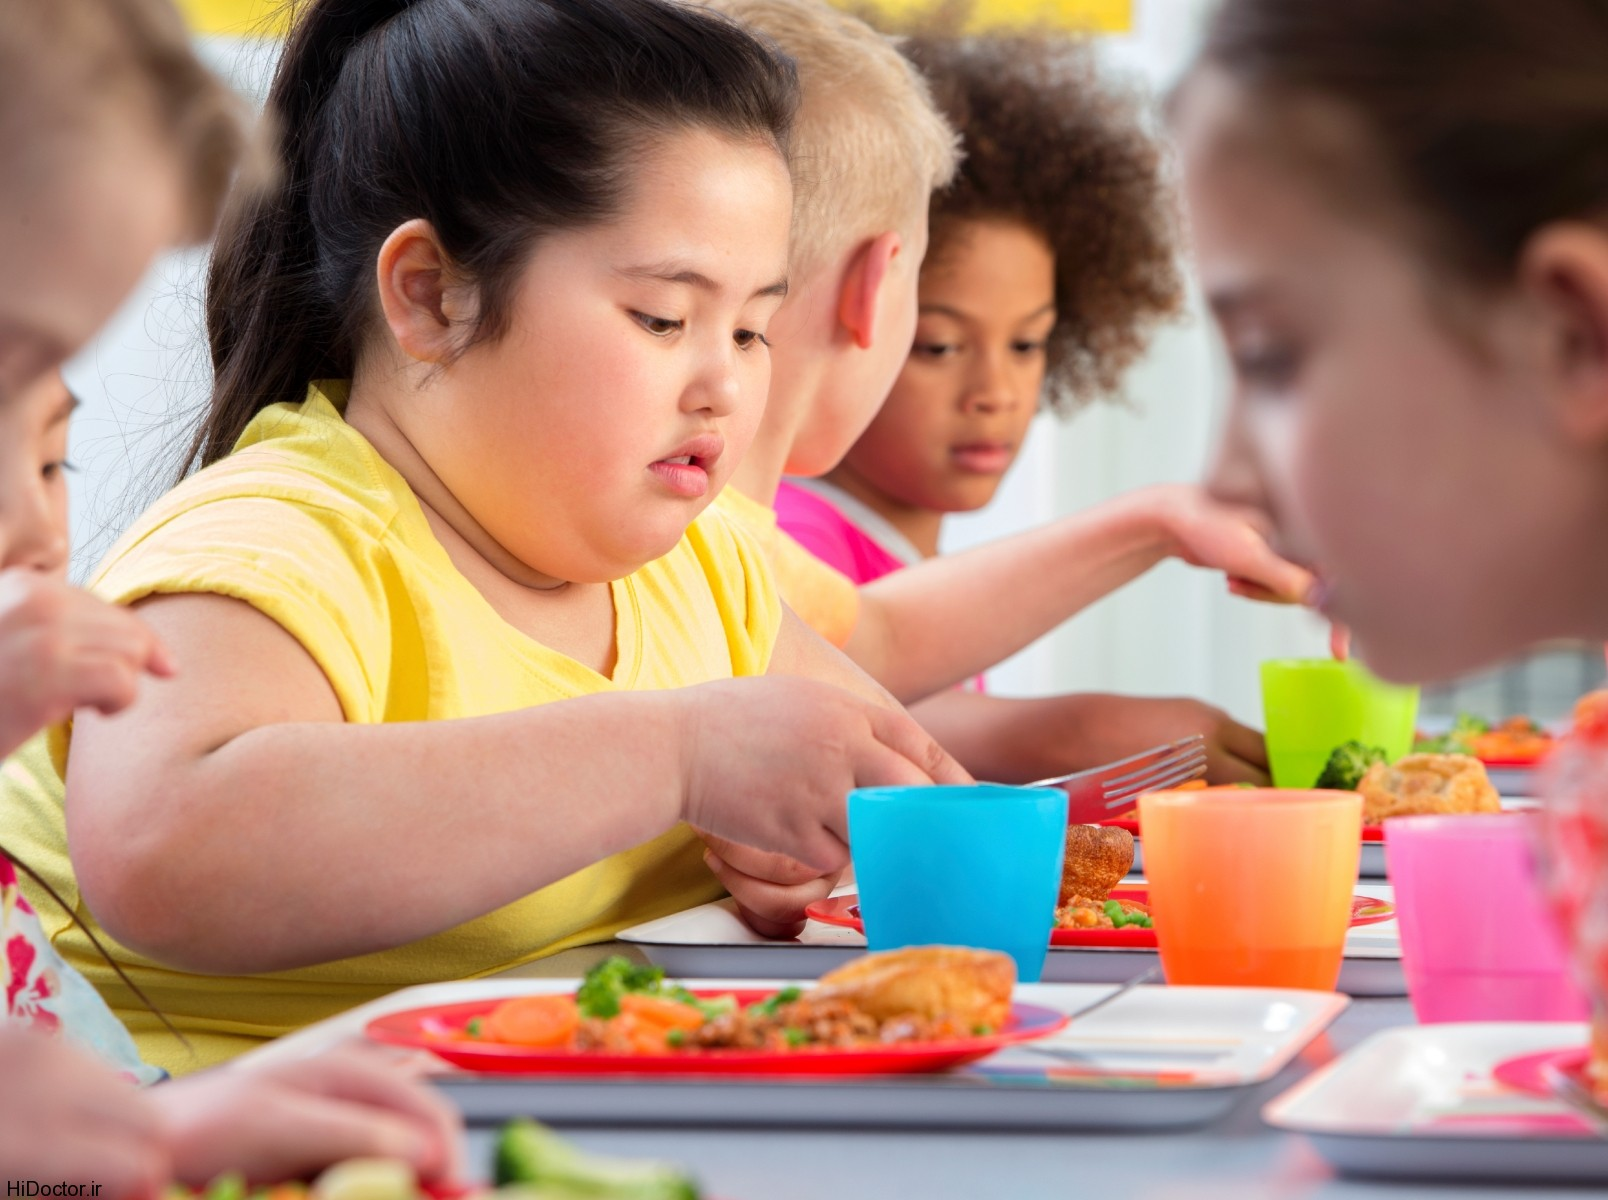 چاقی کودکان معضل اصلی اجتماعی